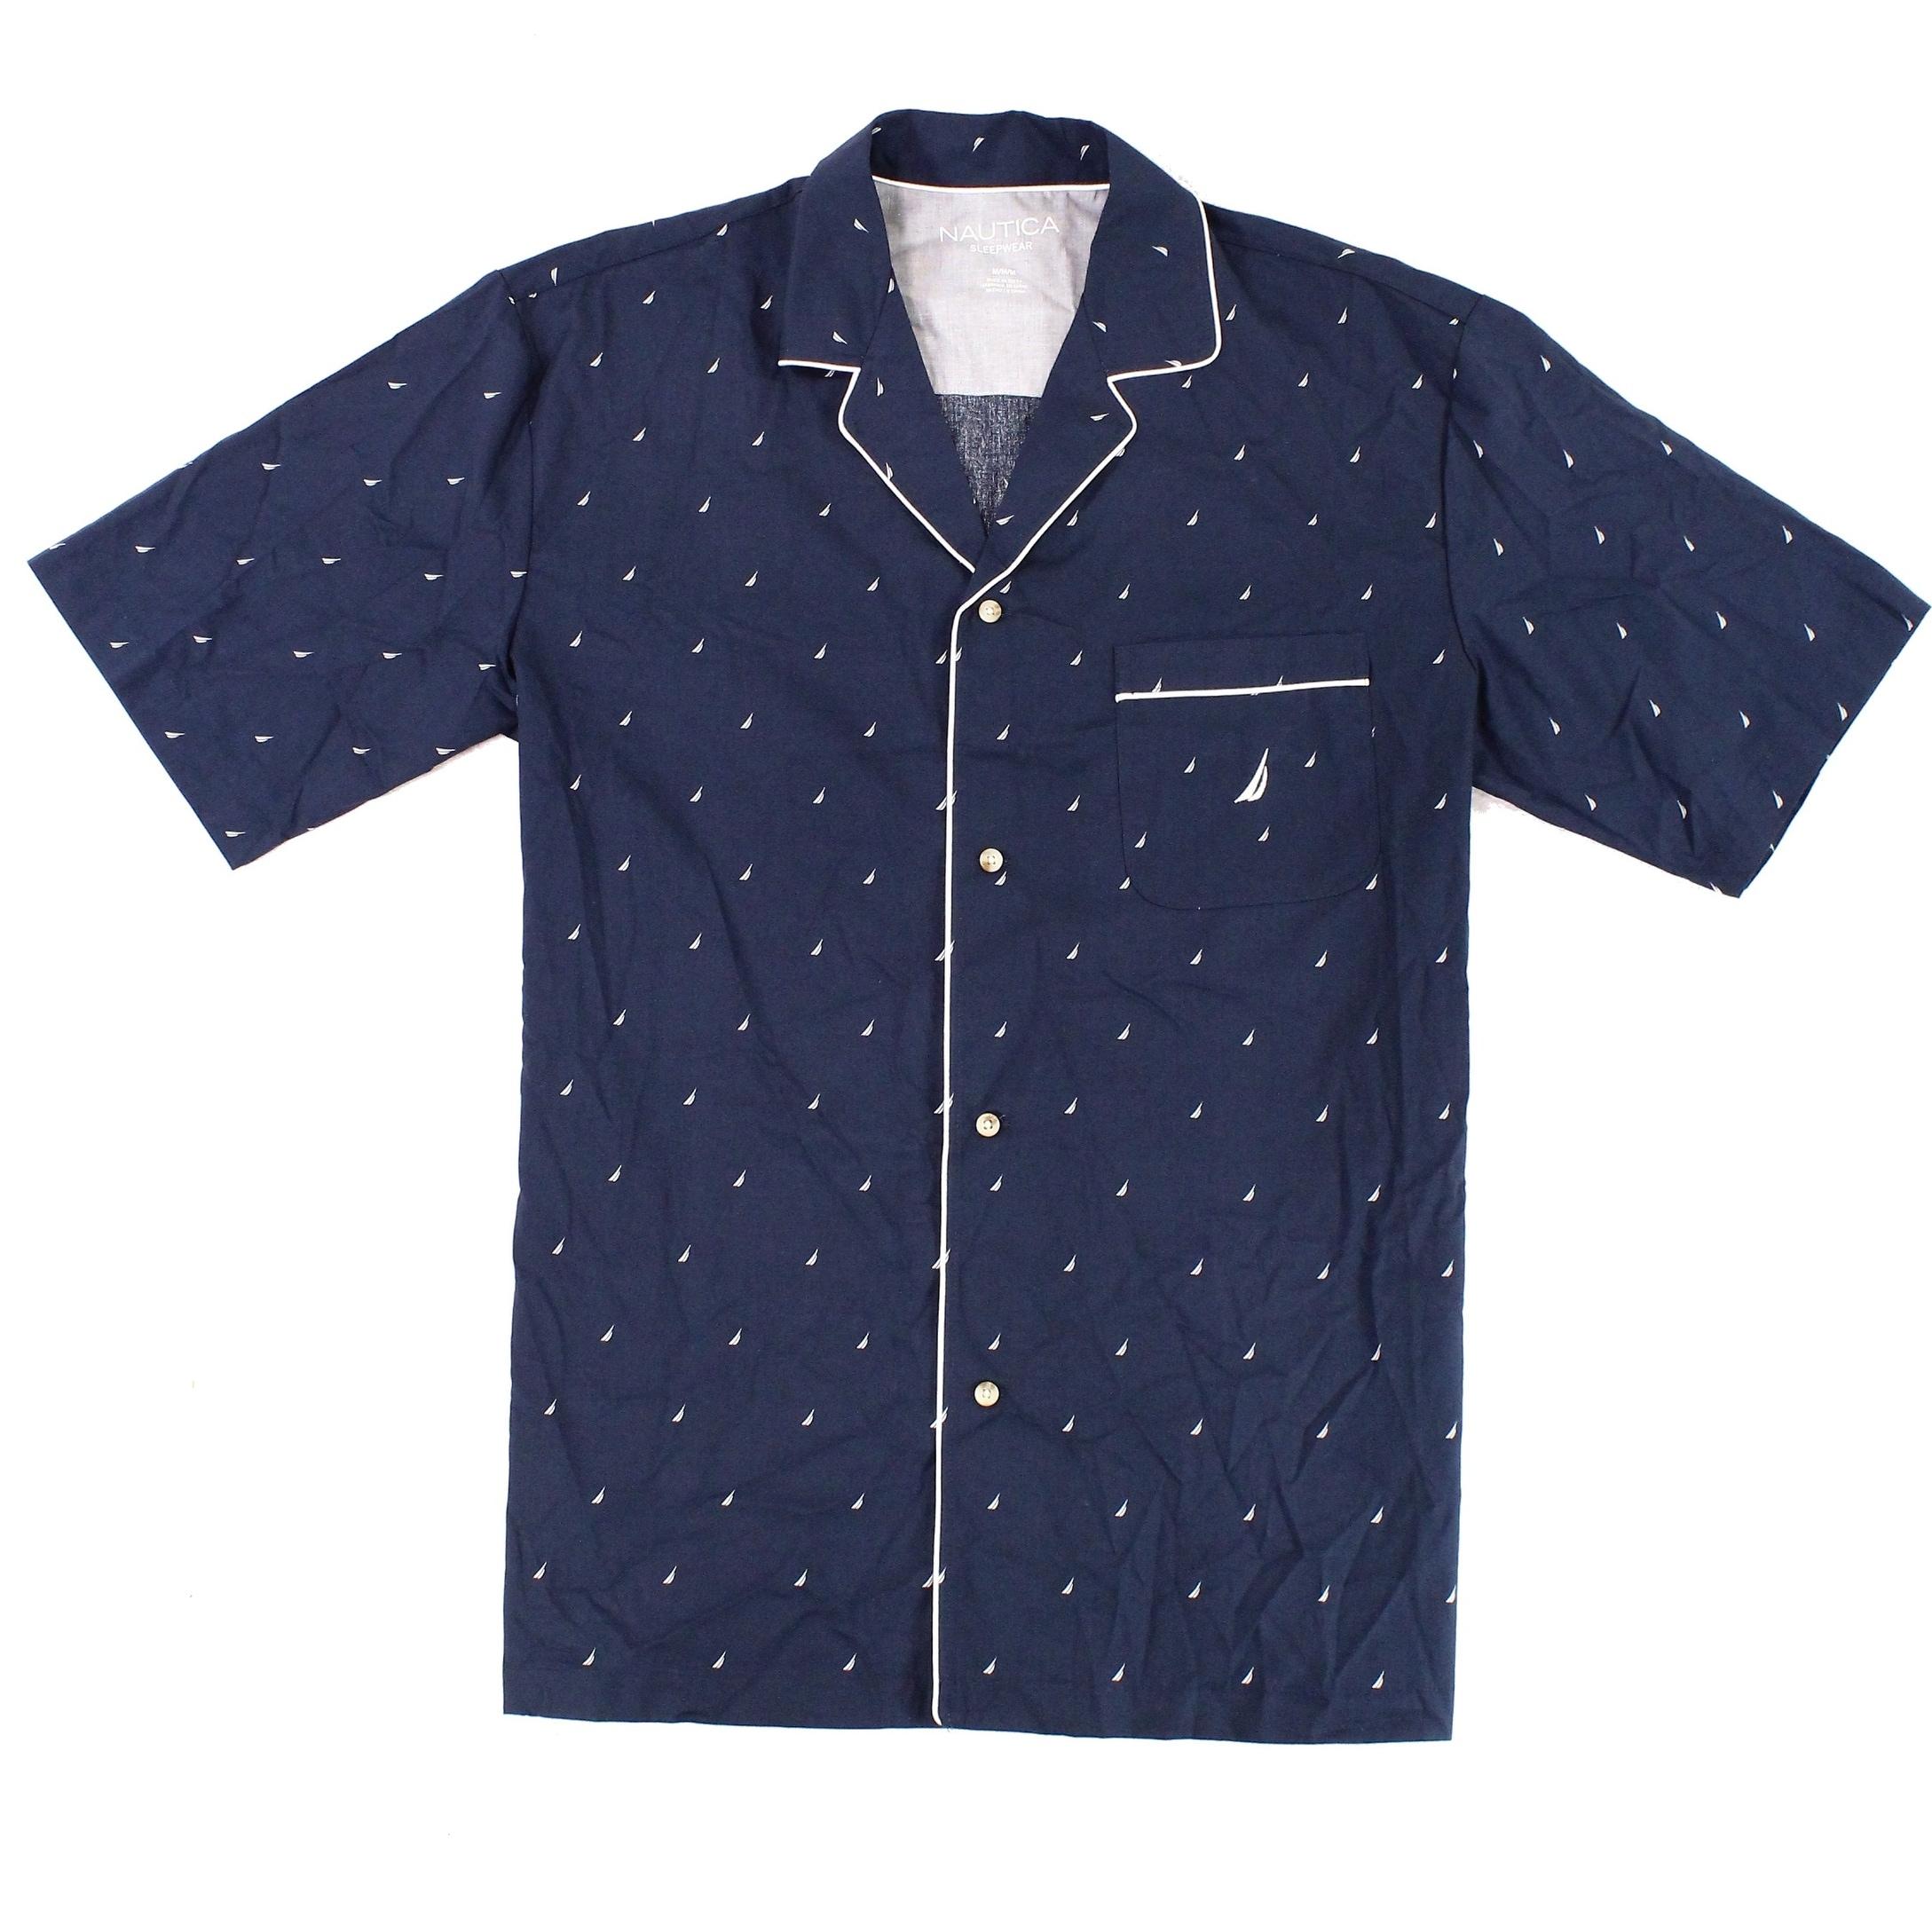 9755ef7d55 Shop Nautica Blue Mens Medium M Sail Boat Print Sleepwear Pajama Shirt -  Free Shipping On Orders Over  45 - Overstock.com - 22472228